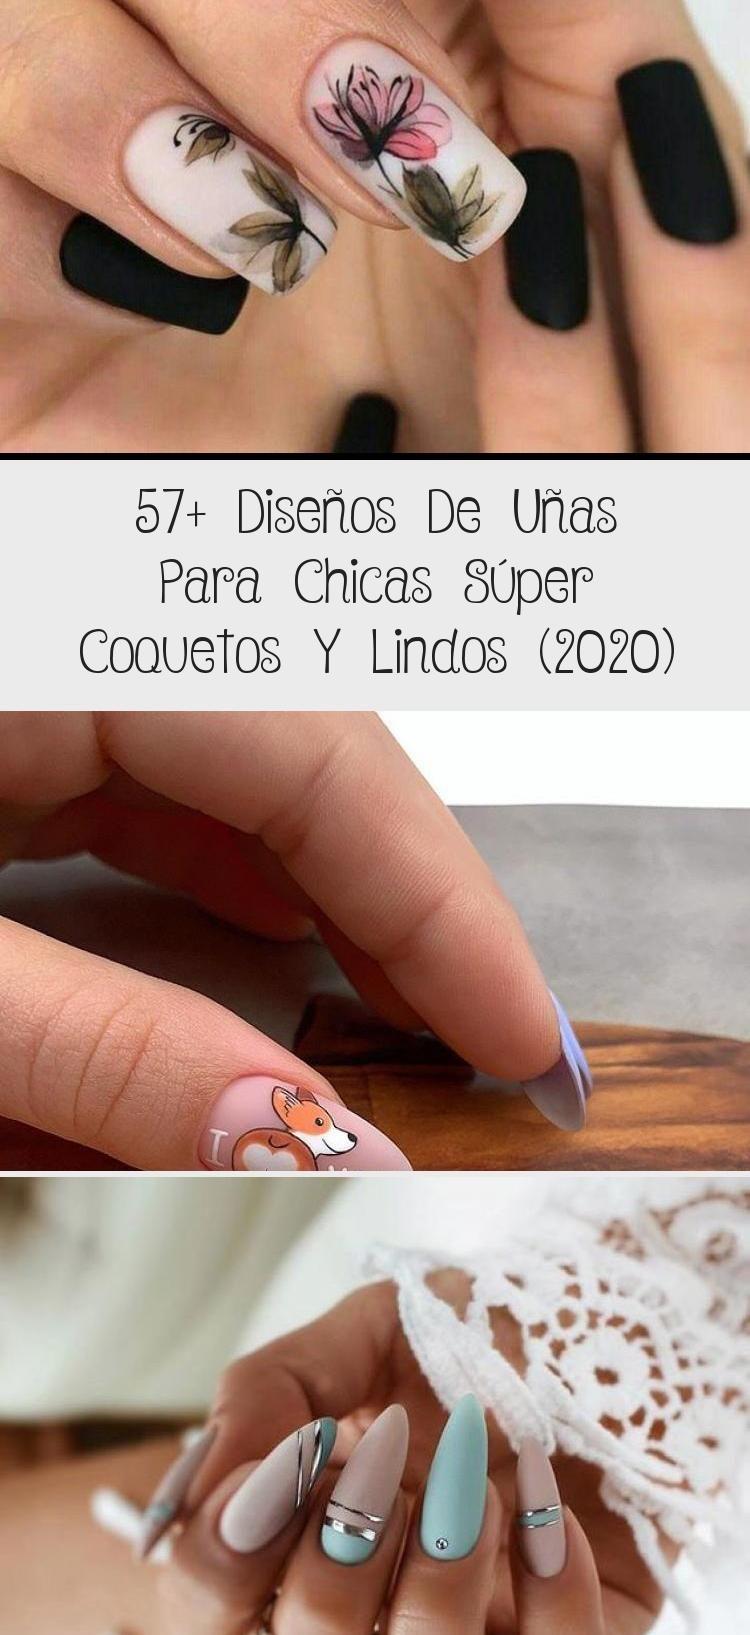 37 Classy Winter Nail Design For Women Career Winter Nail Designs Winter Nails Natural Nail Designs